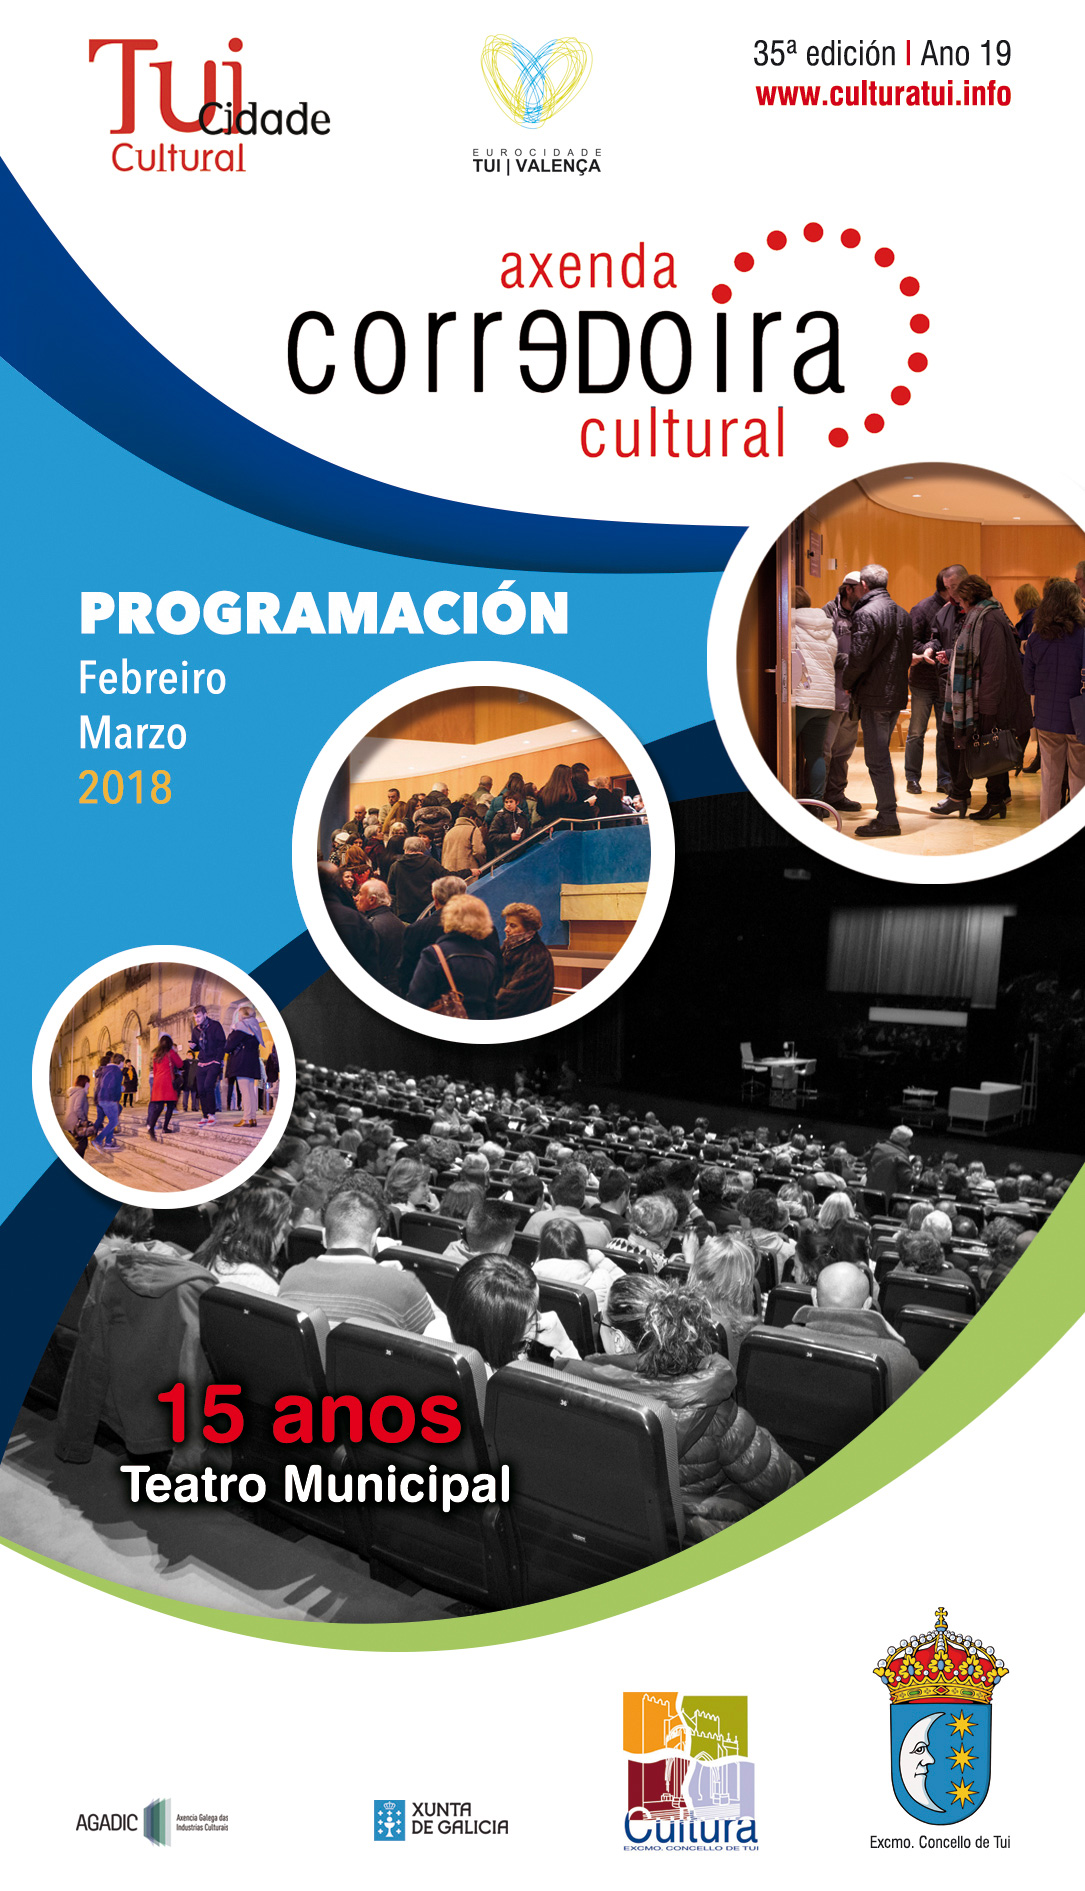 concello-de-tui-Corredoira-Cultural-1-2018-01